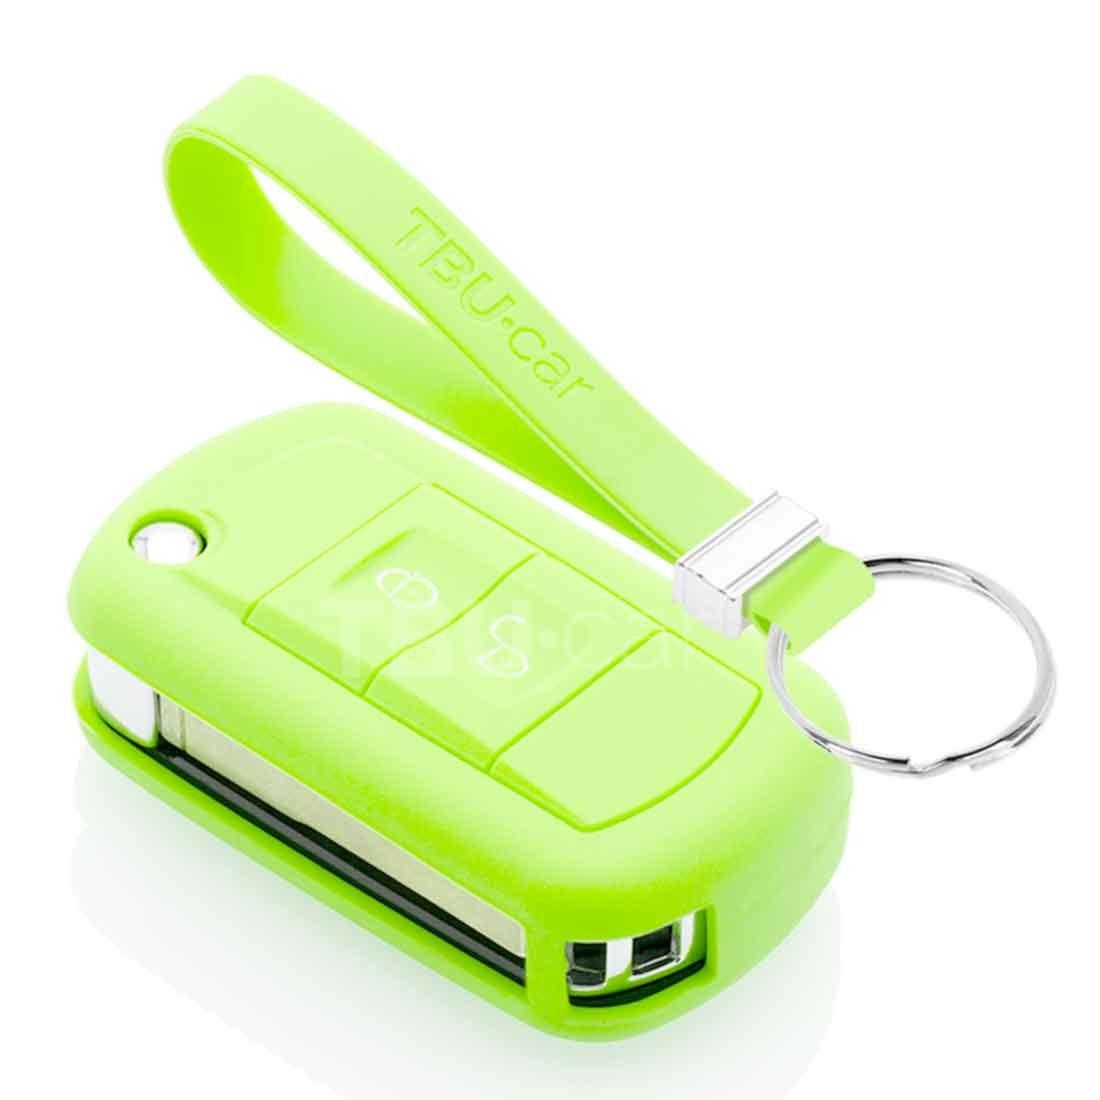 TBU car TBU car Sleutel cover compatibel met Land Rover - Silicone sleutelhoesje - beschermhoesje autosleutel - Glow in the Dark